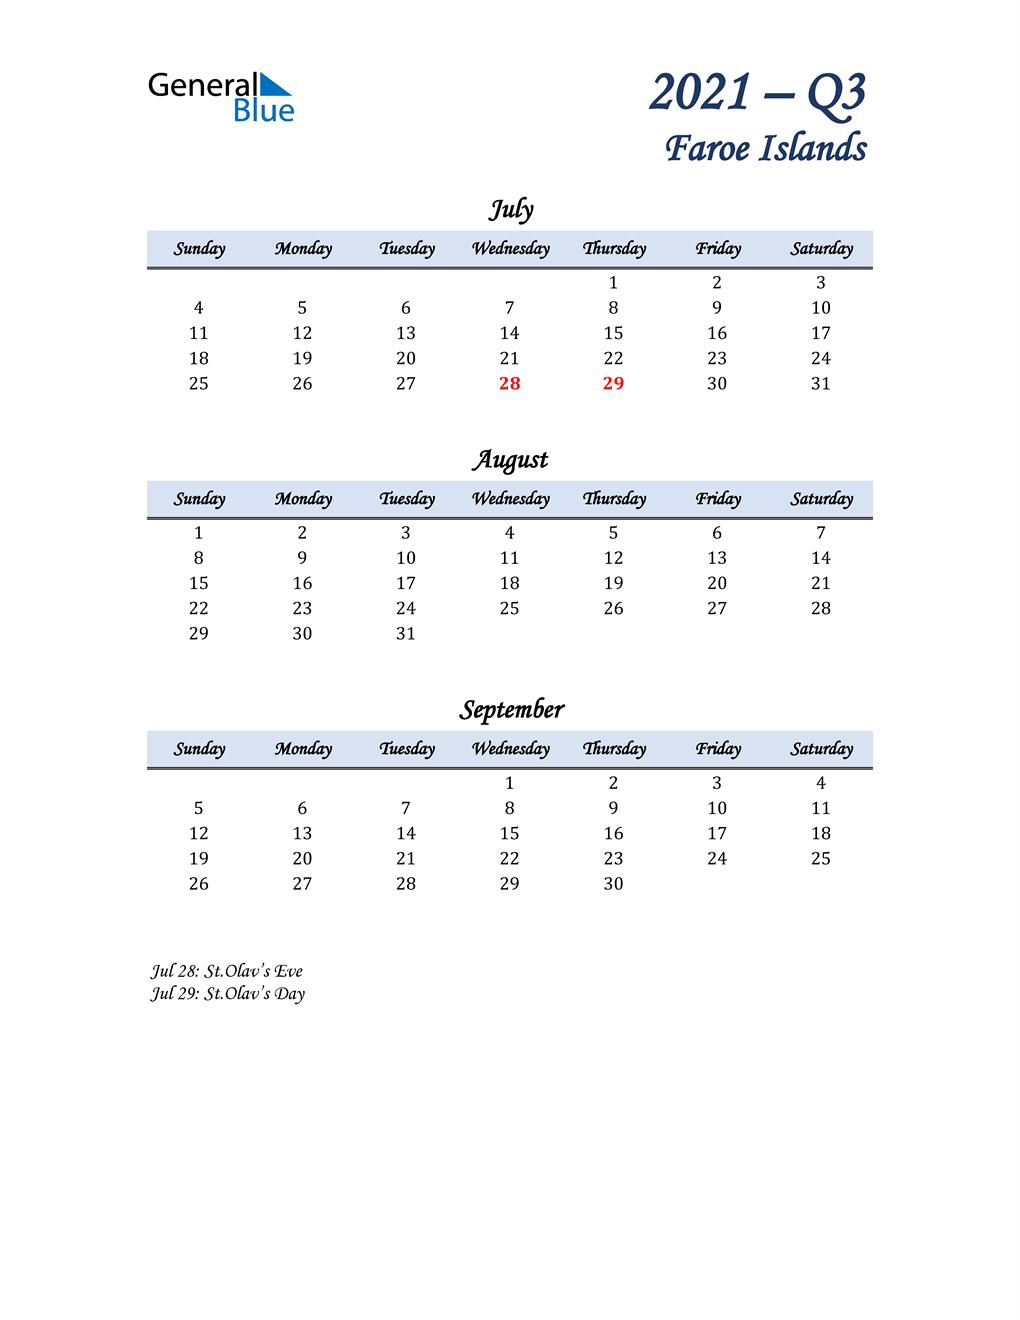 July, August, and September Calendar for Faroe Islands